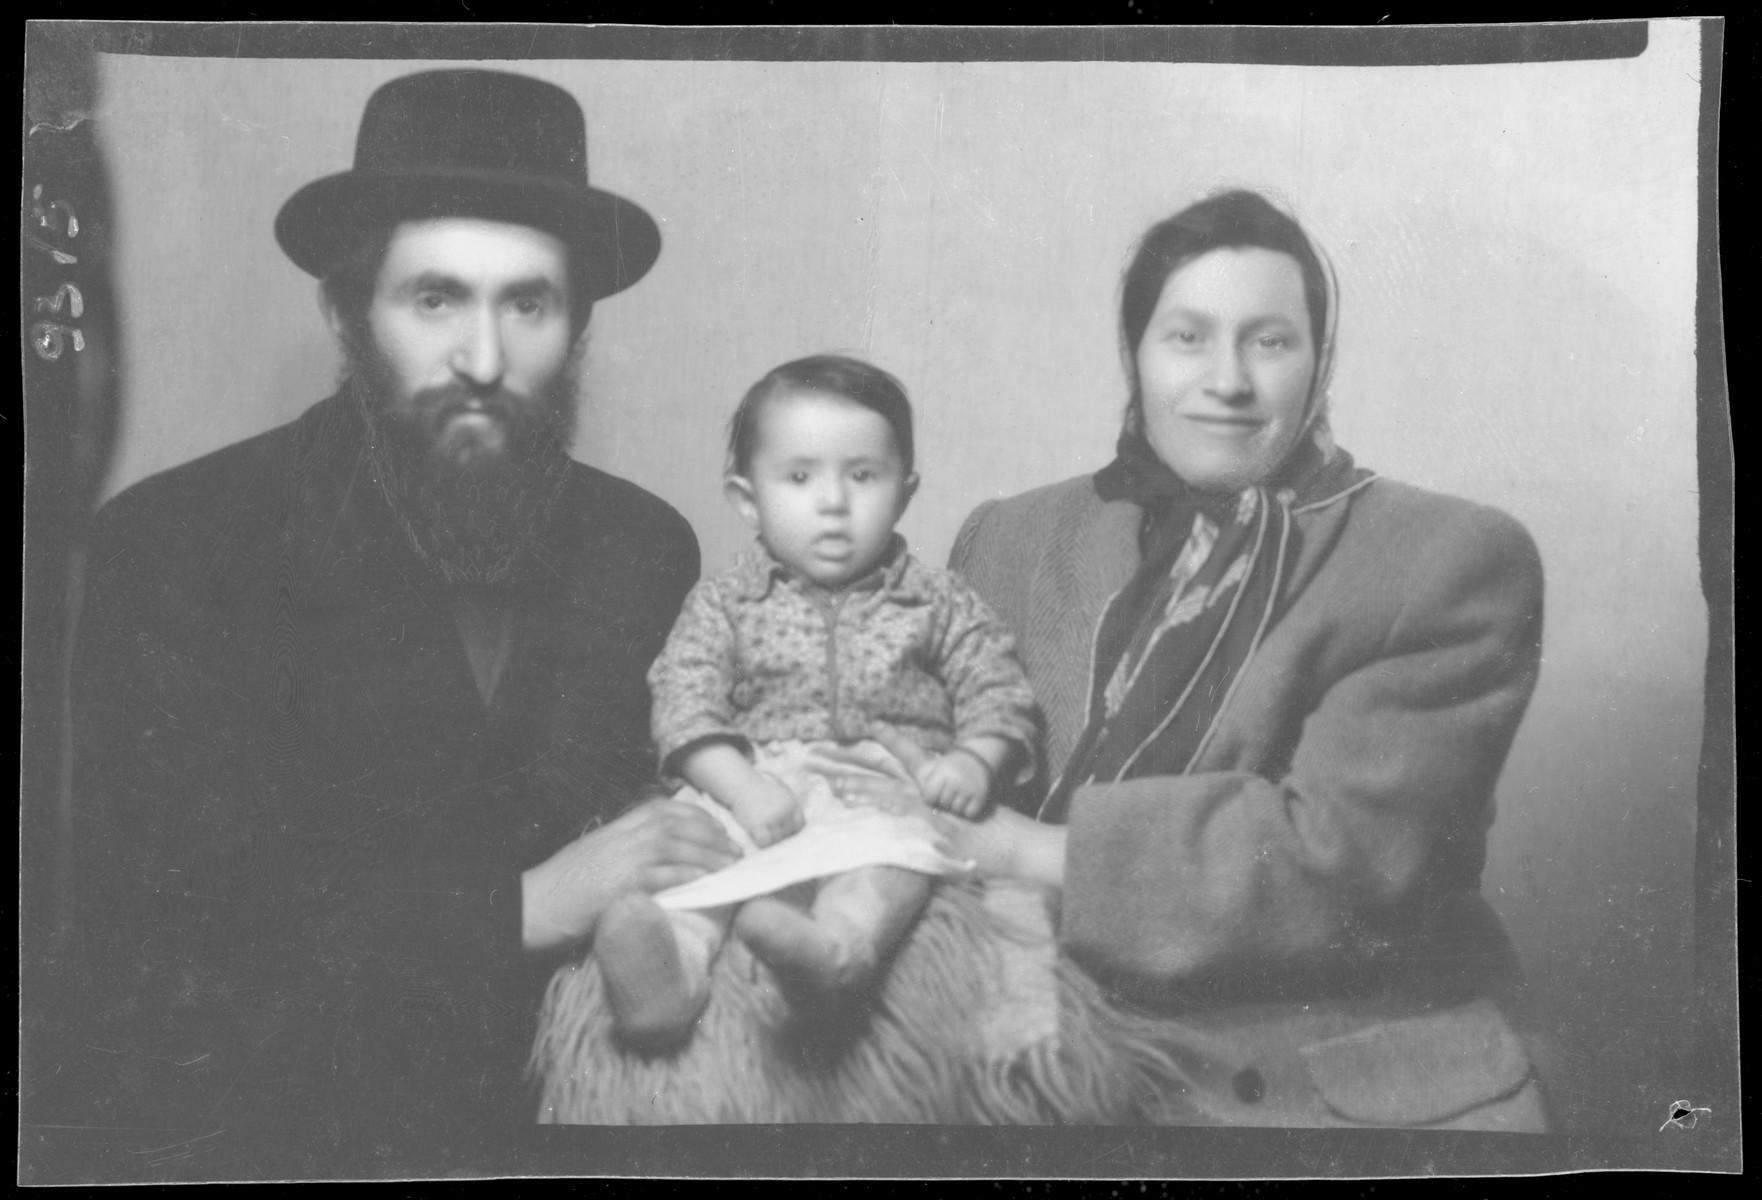 Studio portrait of Salamon Geriner, his wife and child.